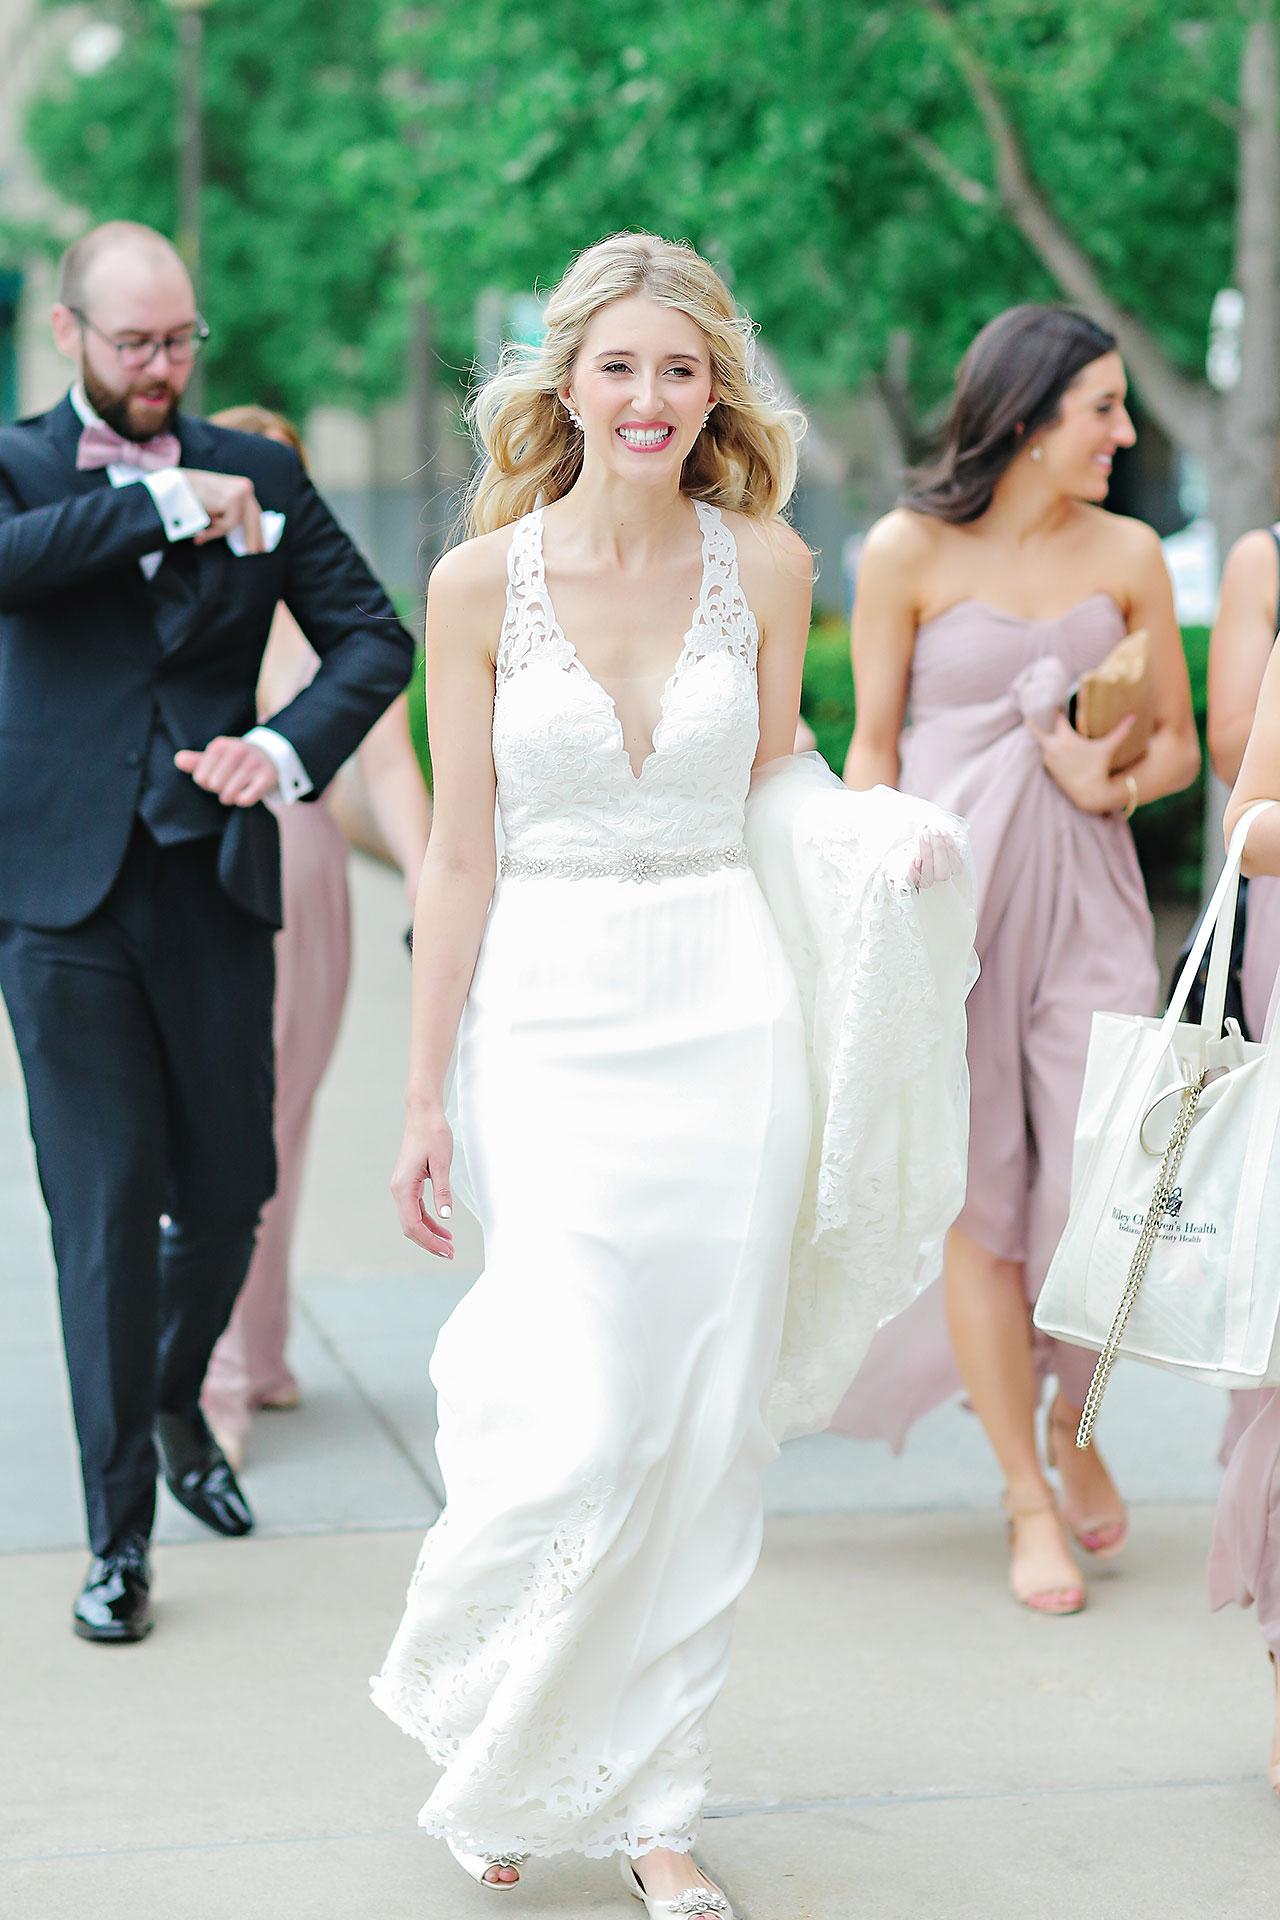 Allison Jeff Union Station Crowne Plaza Indianapolis wedding 050